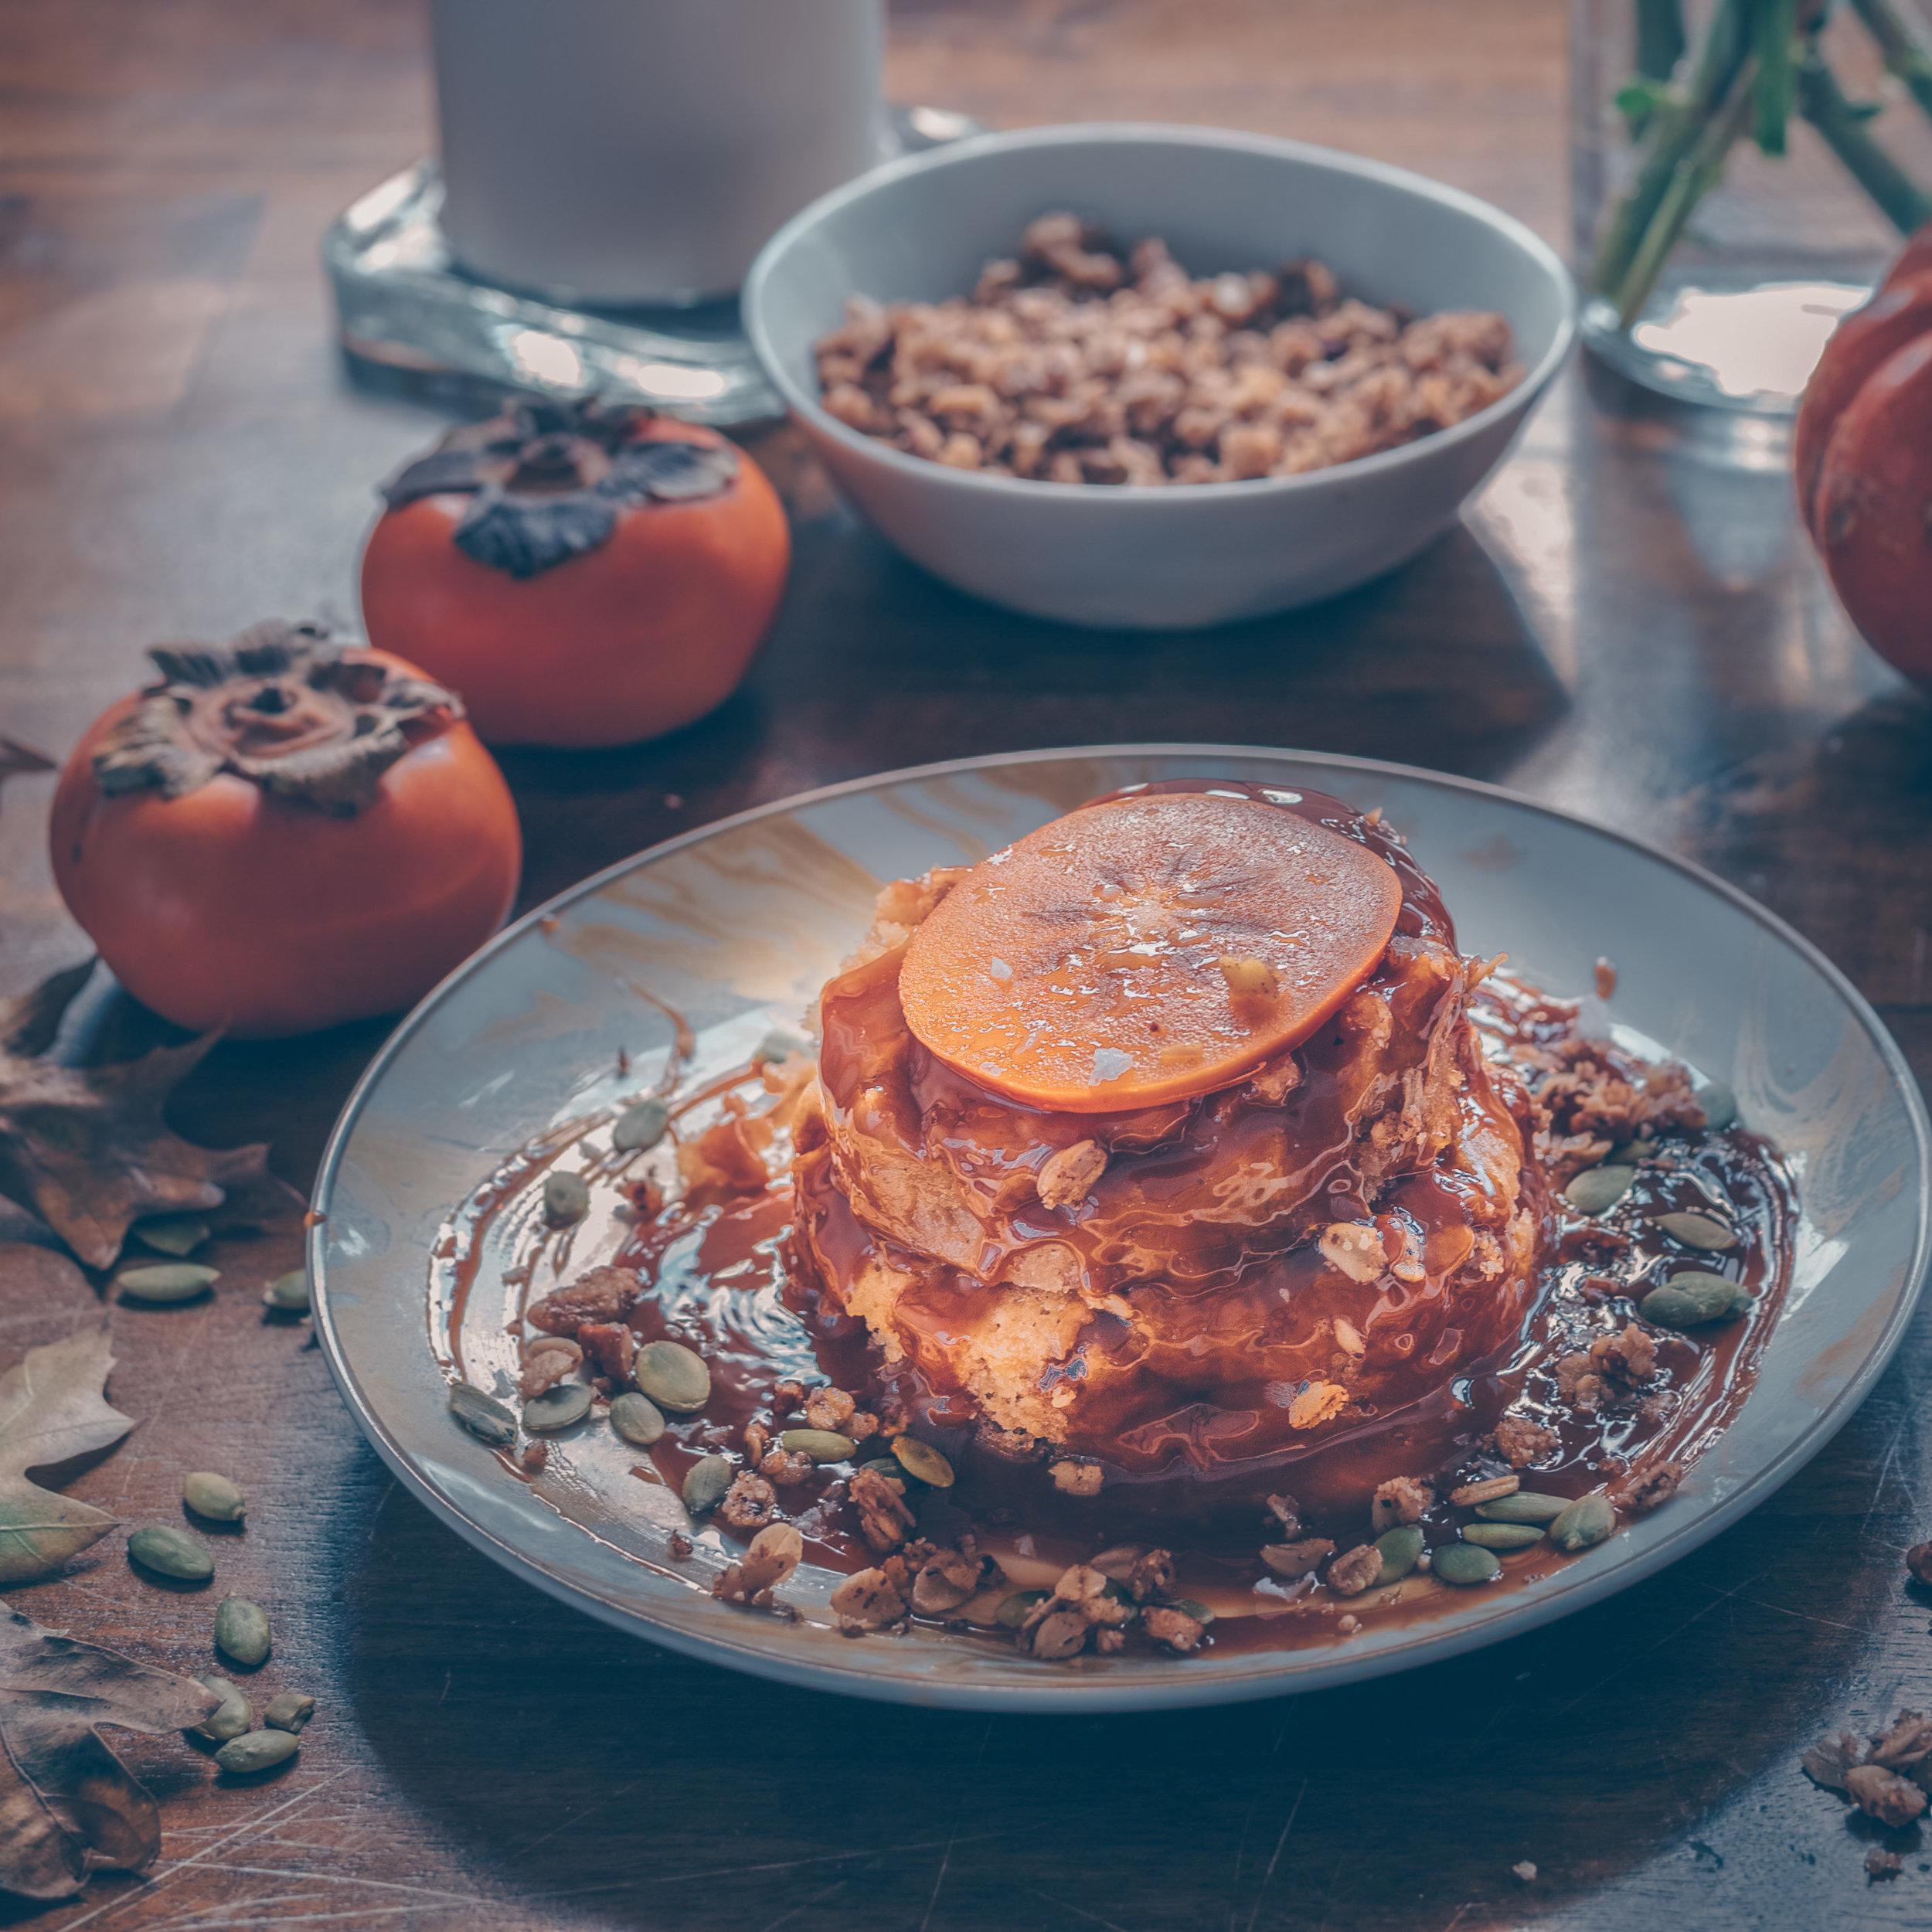 pumpkin cake persimmon closeup - edit.jpg